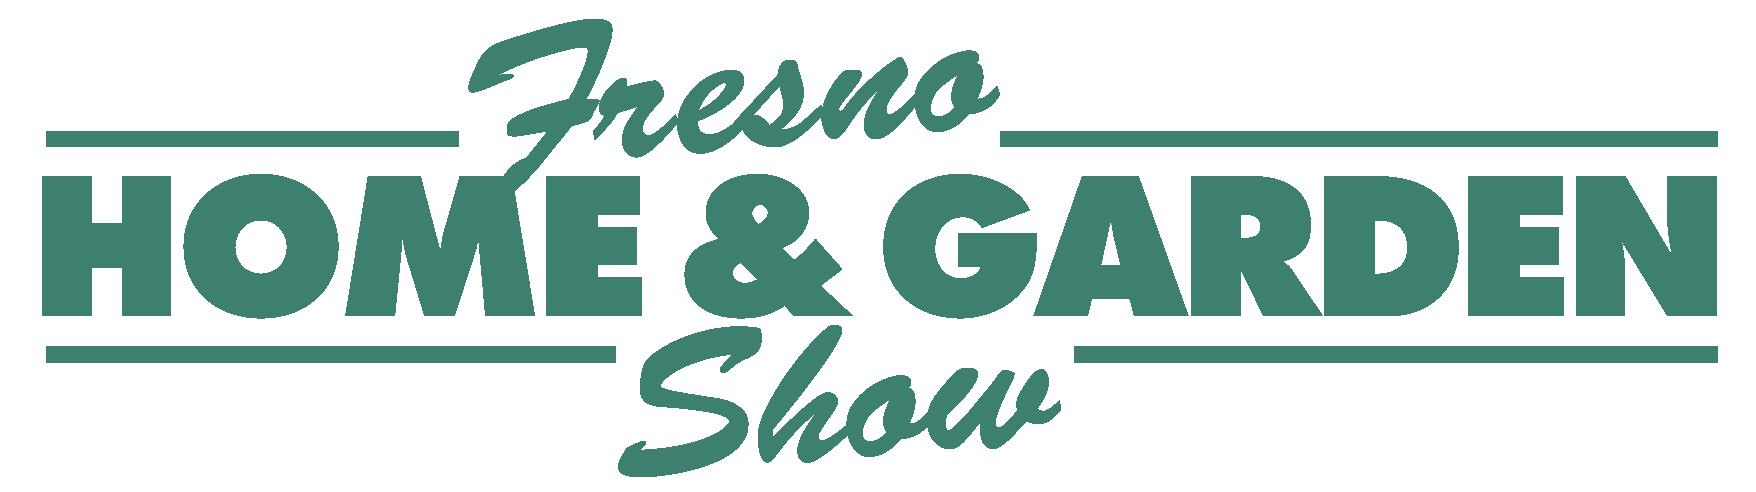 HG Logo Green